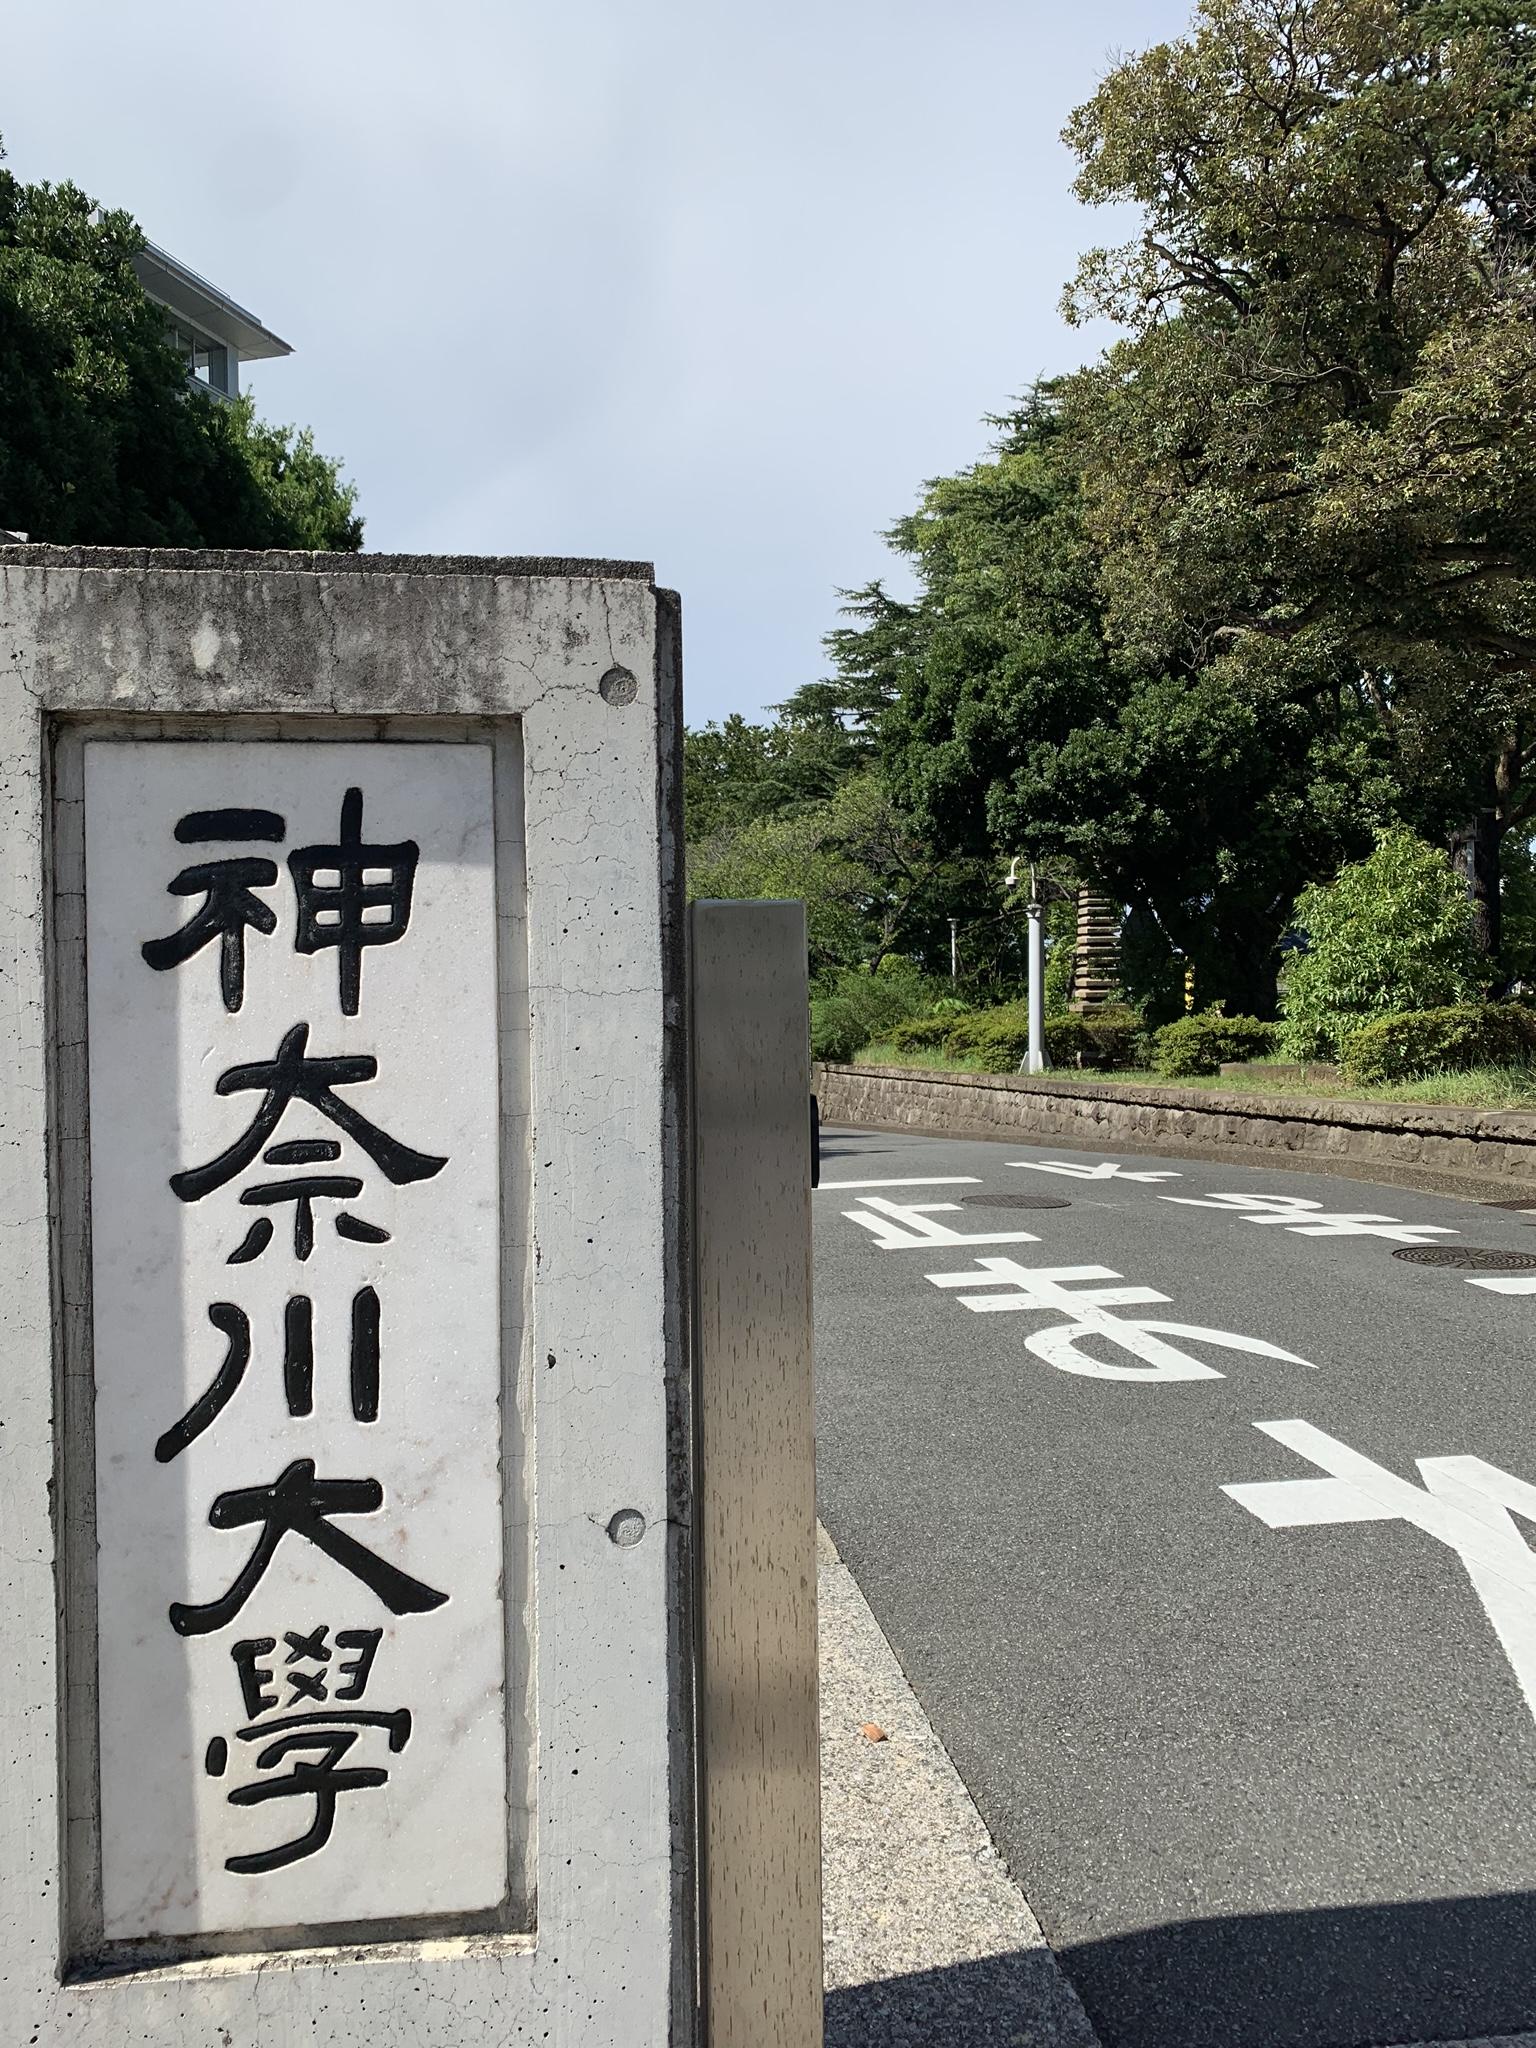 Kanagawa University Open Campus